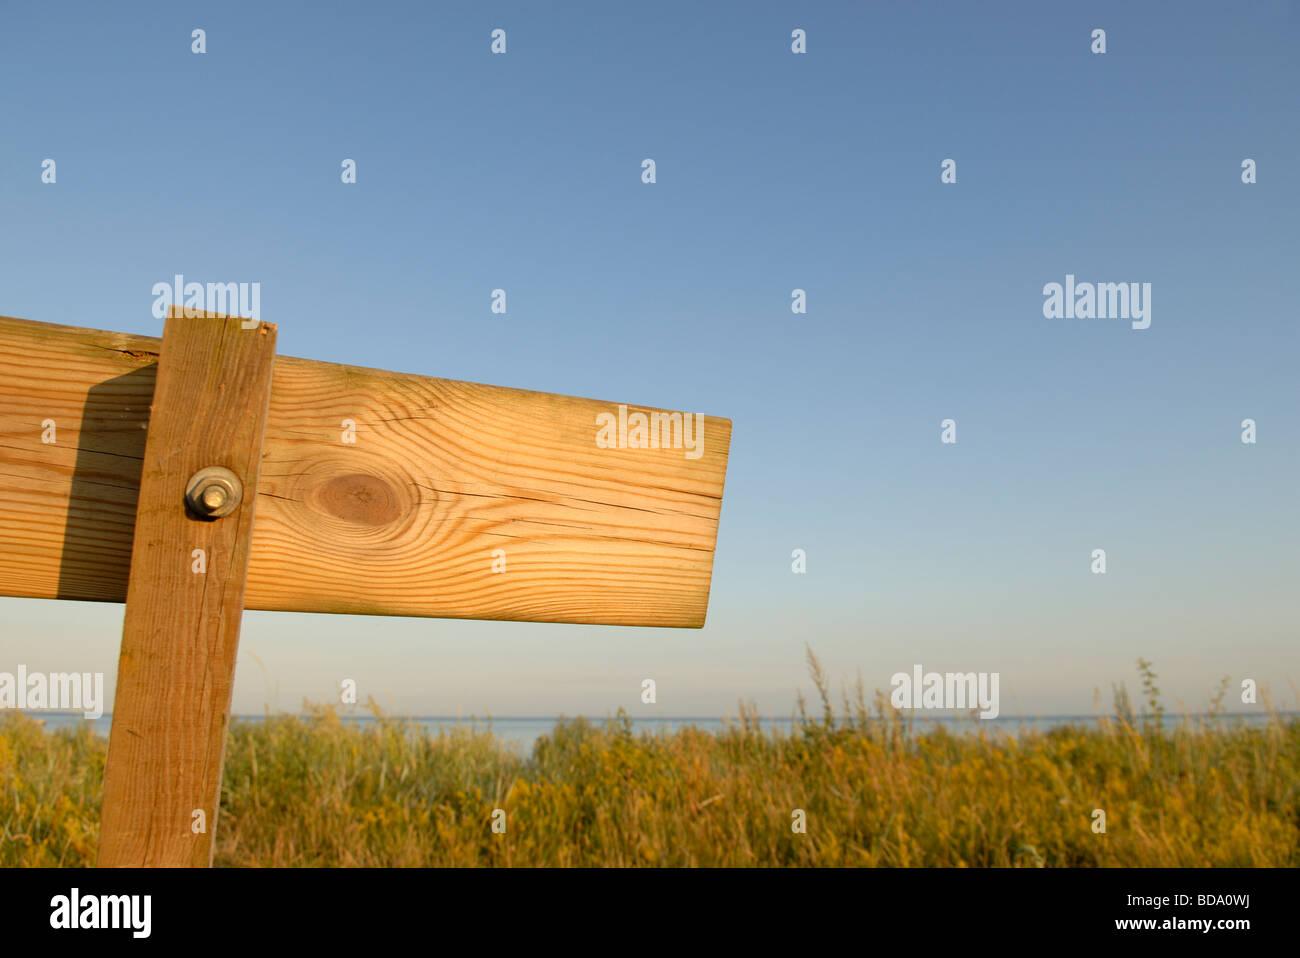 COASTAL LANDSCAPE BEHIND BENCH - Stock Image